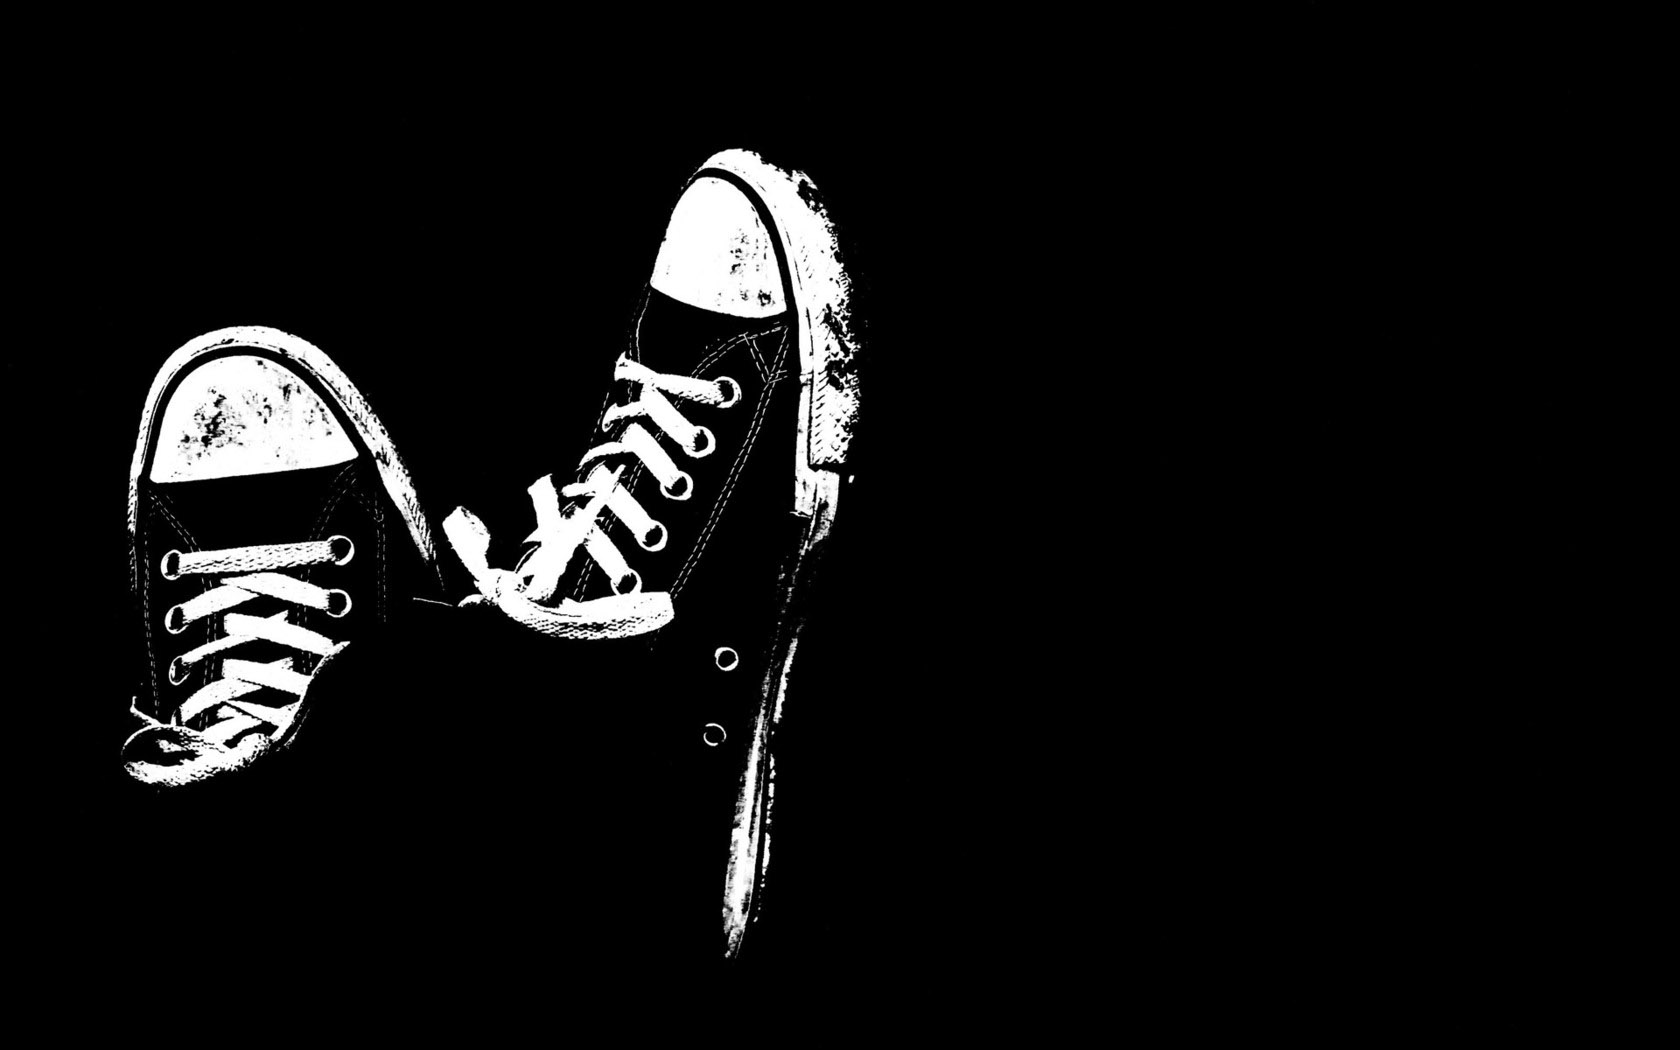 wallpaper black and white HD 1680x1050